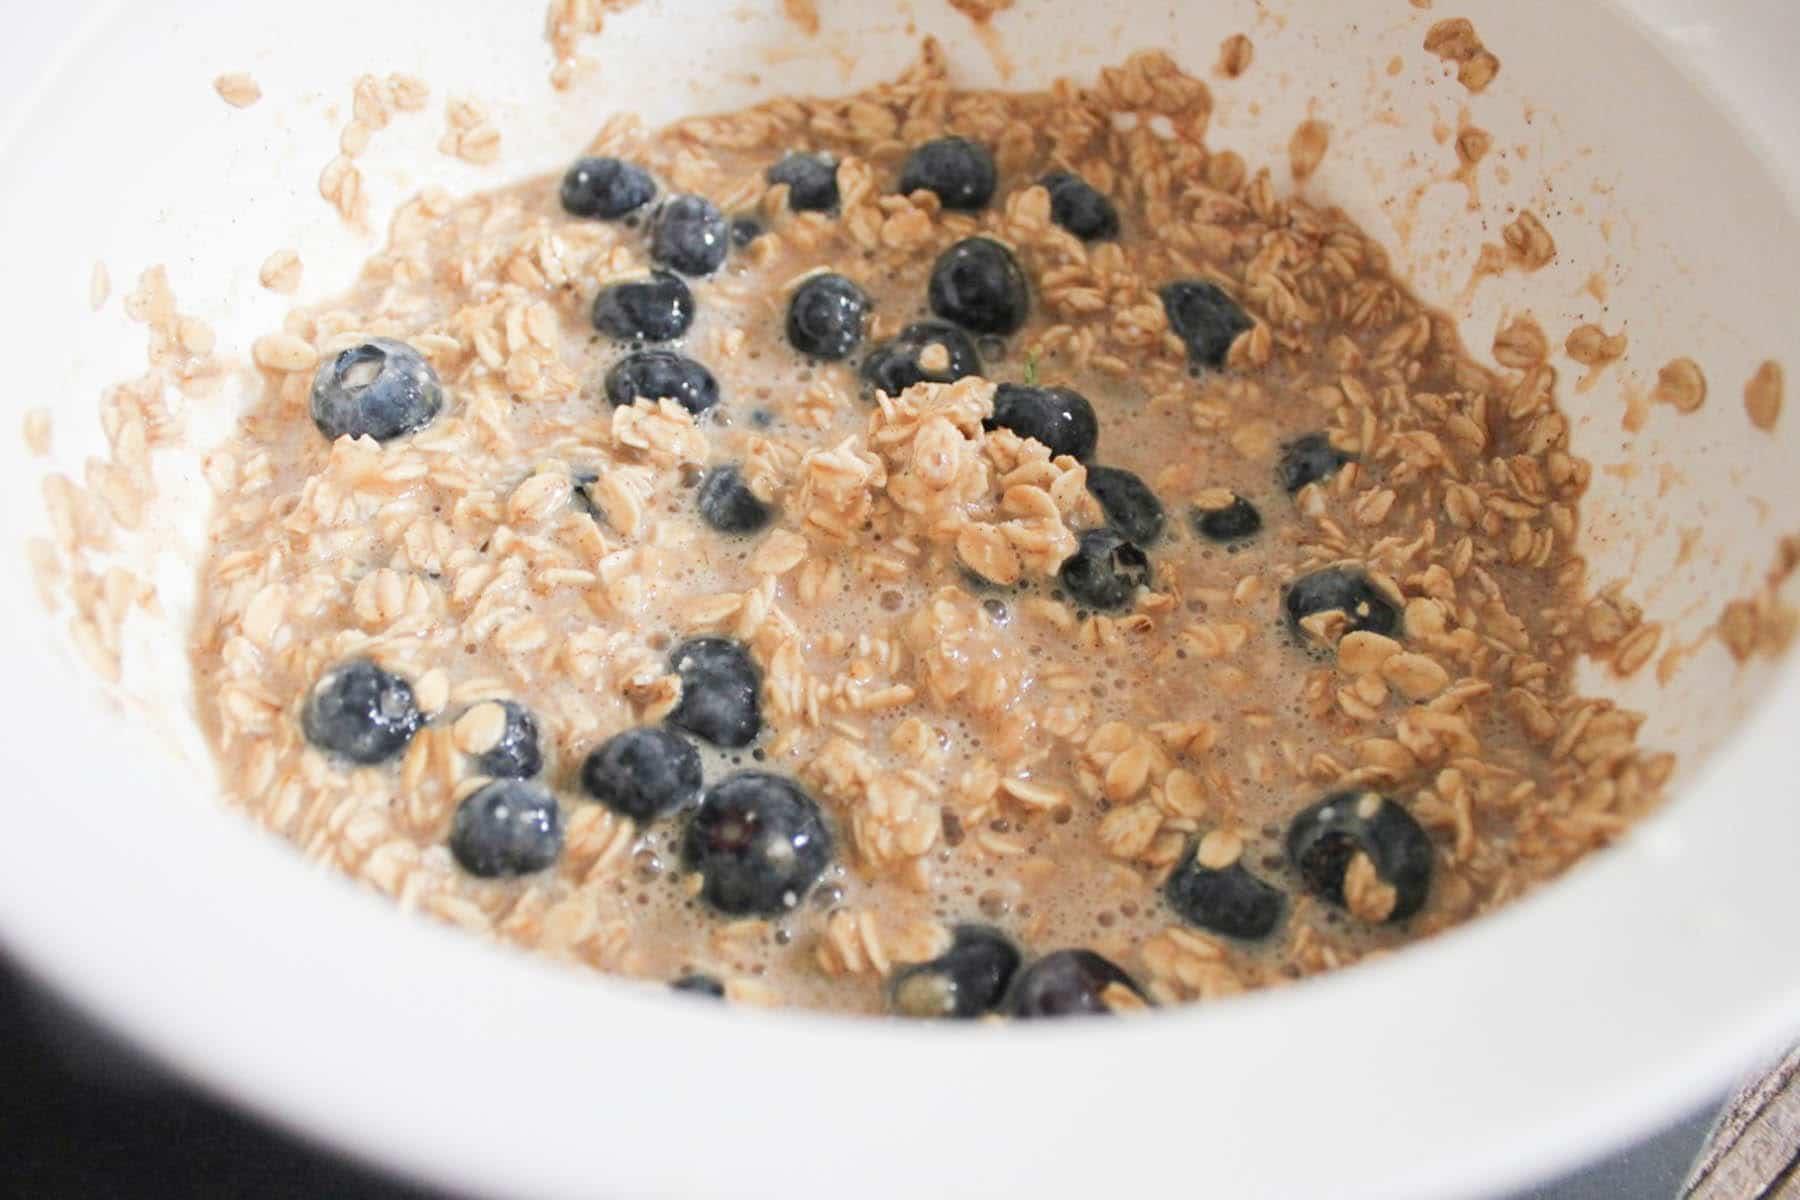 gluten-free-blueberry-banana-baked-oatmeal-bites-step-4